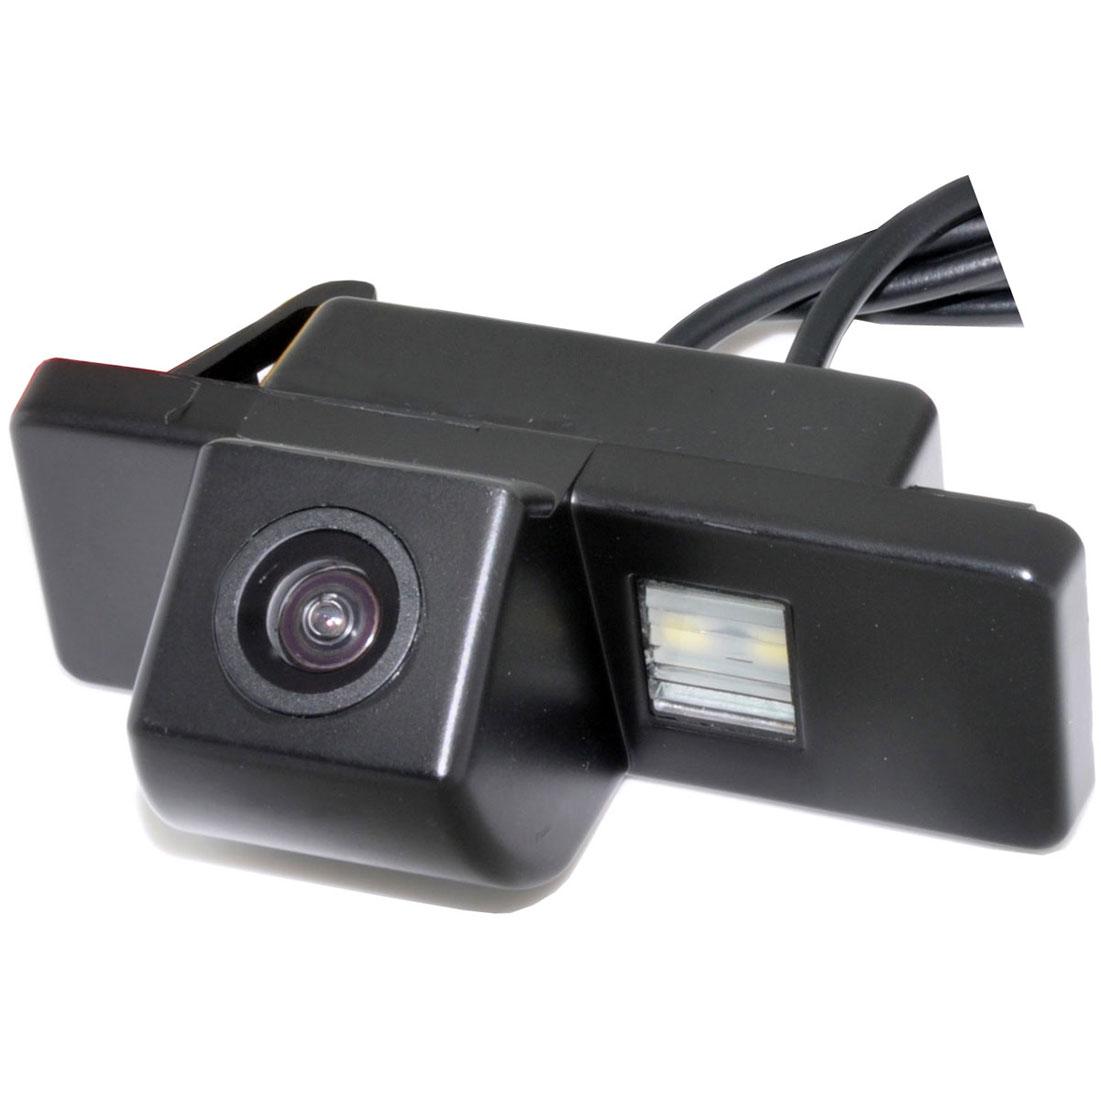 HD CCD di Retrovisione Telecamera Retromarcia Per Nissan QASHQAI X-TRAIL Geniss Citroen C4 C5 C-Triomphe Peugeot 307CC Pathfinder Dualis